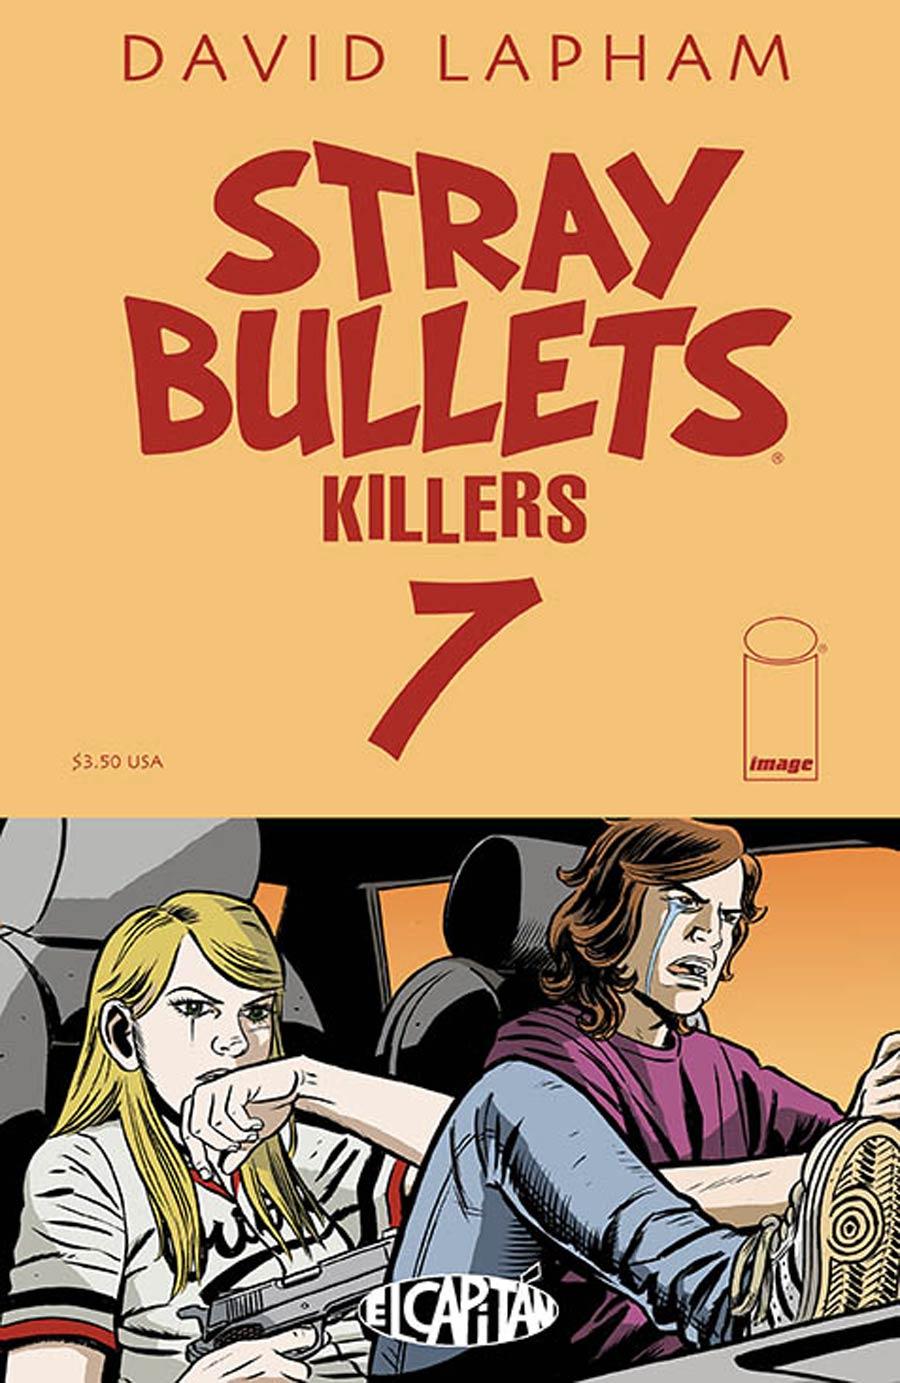 Stray Bullets Killers #7